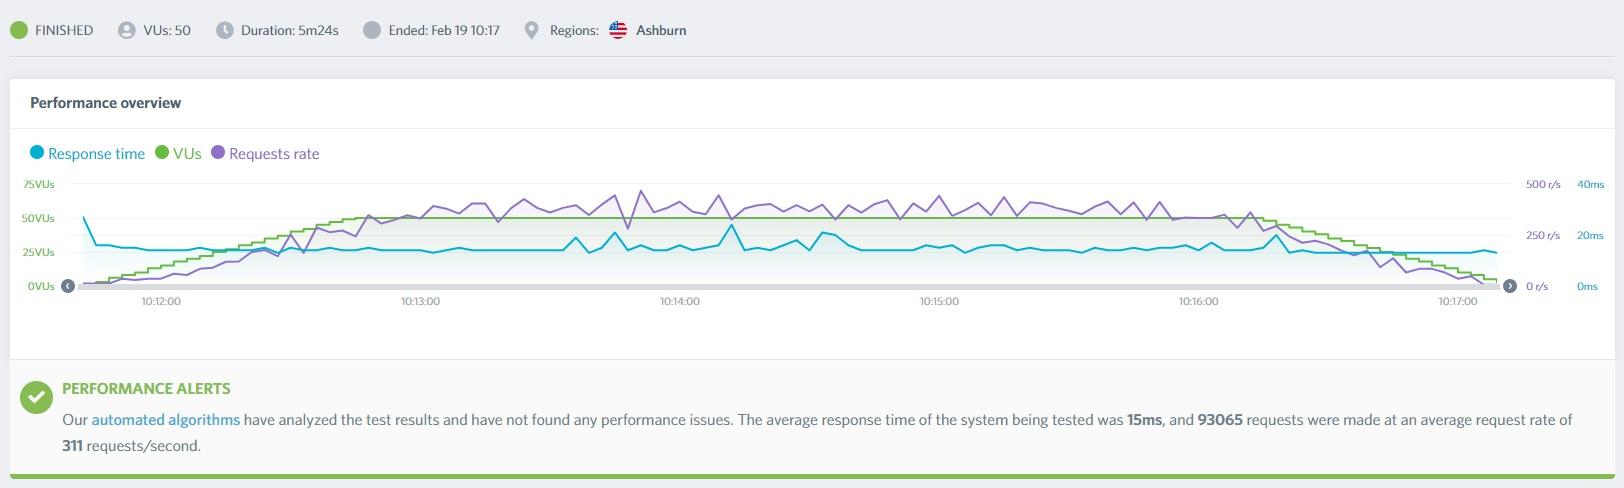 Interserver Shared Hosting - load impact test